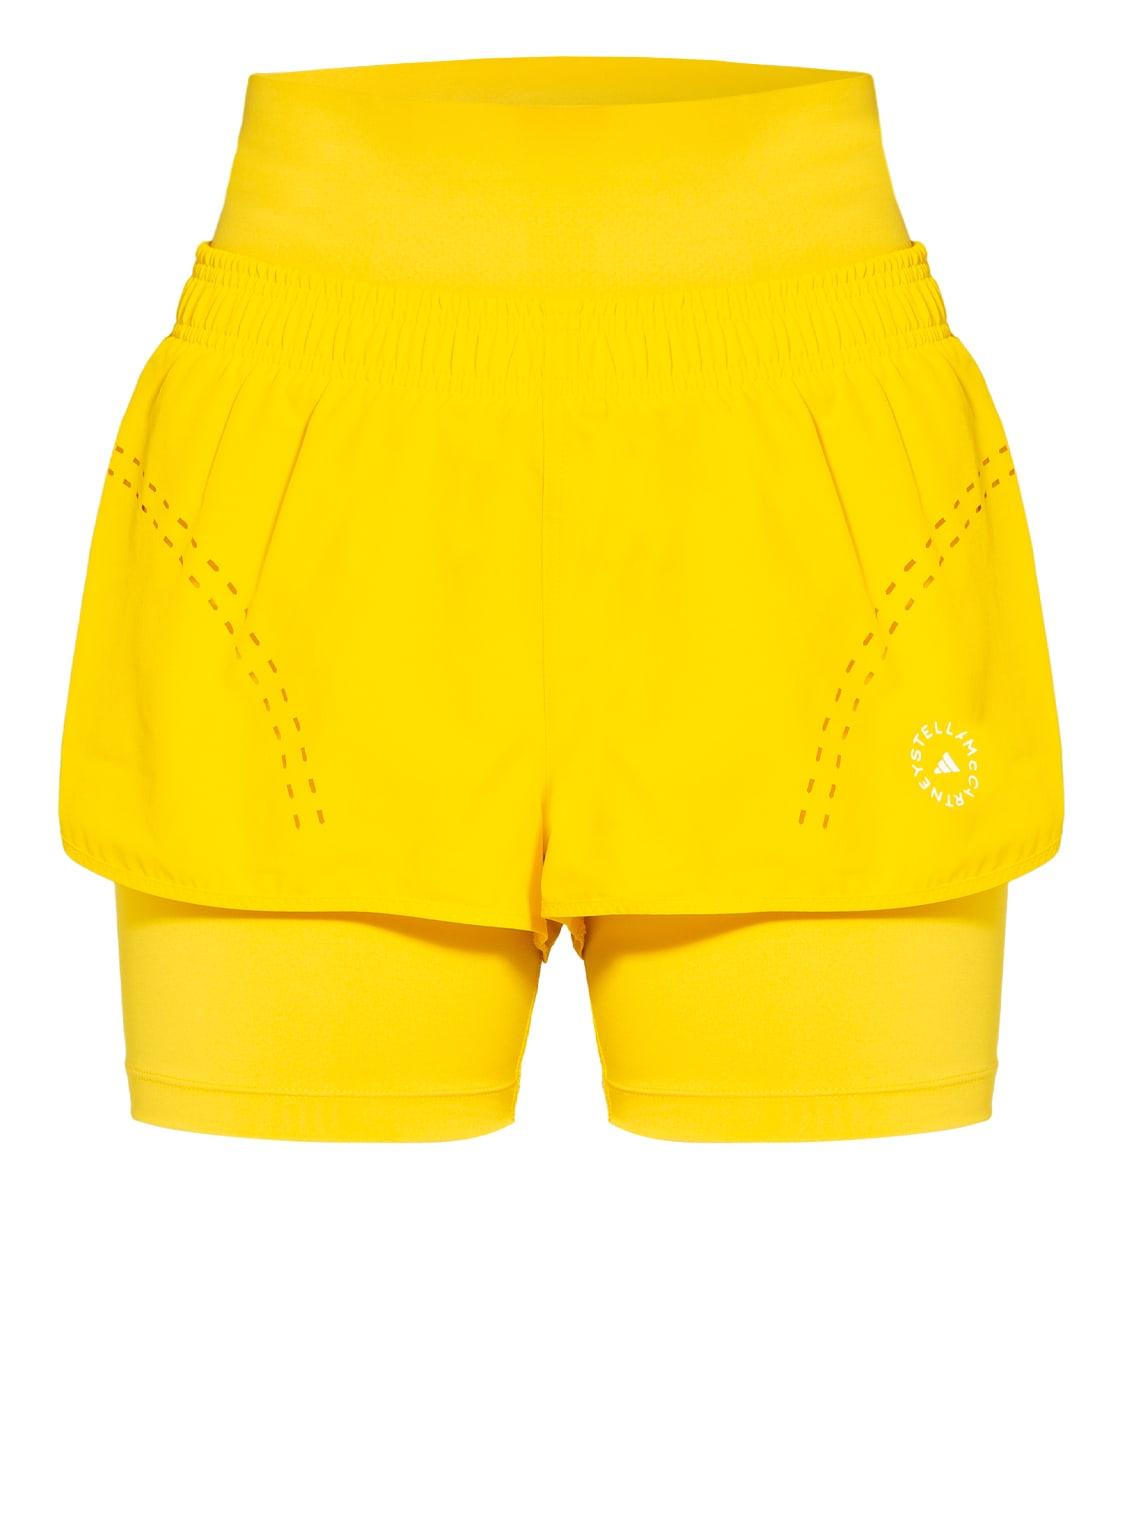 Image of Adidas By Stella Mccartney 2-In-1-Fitnessshorts Truepurpose gelb